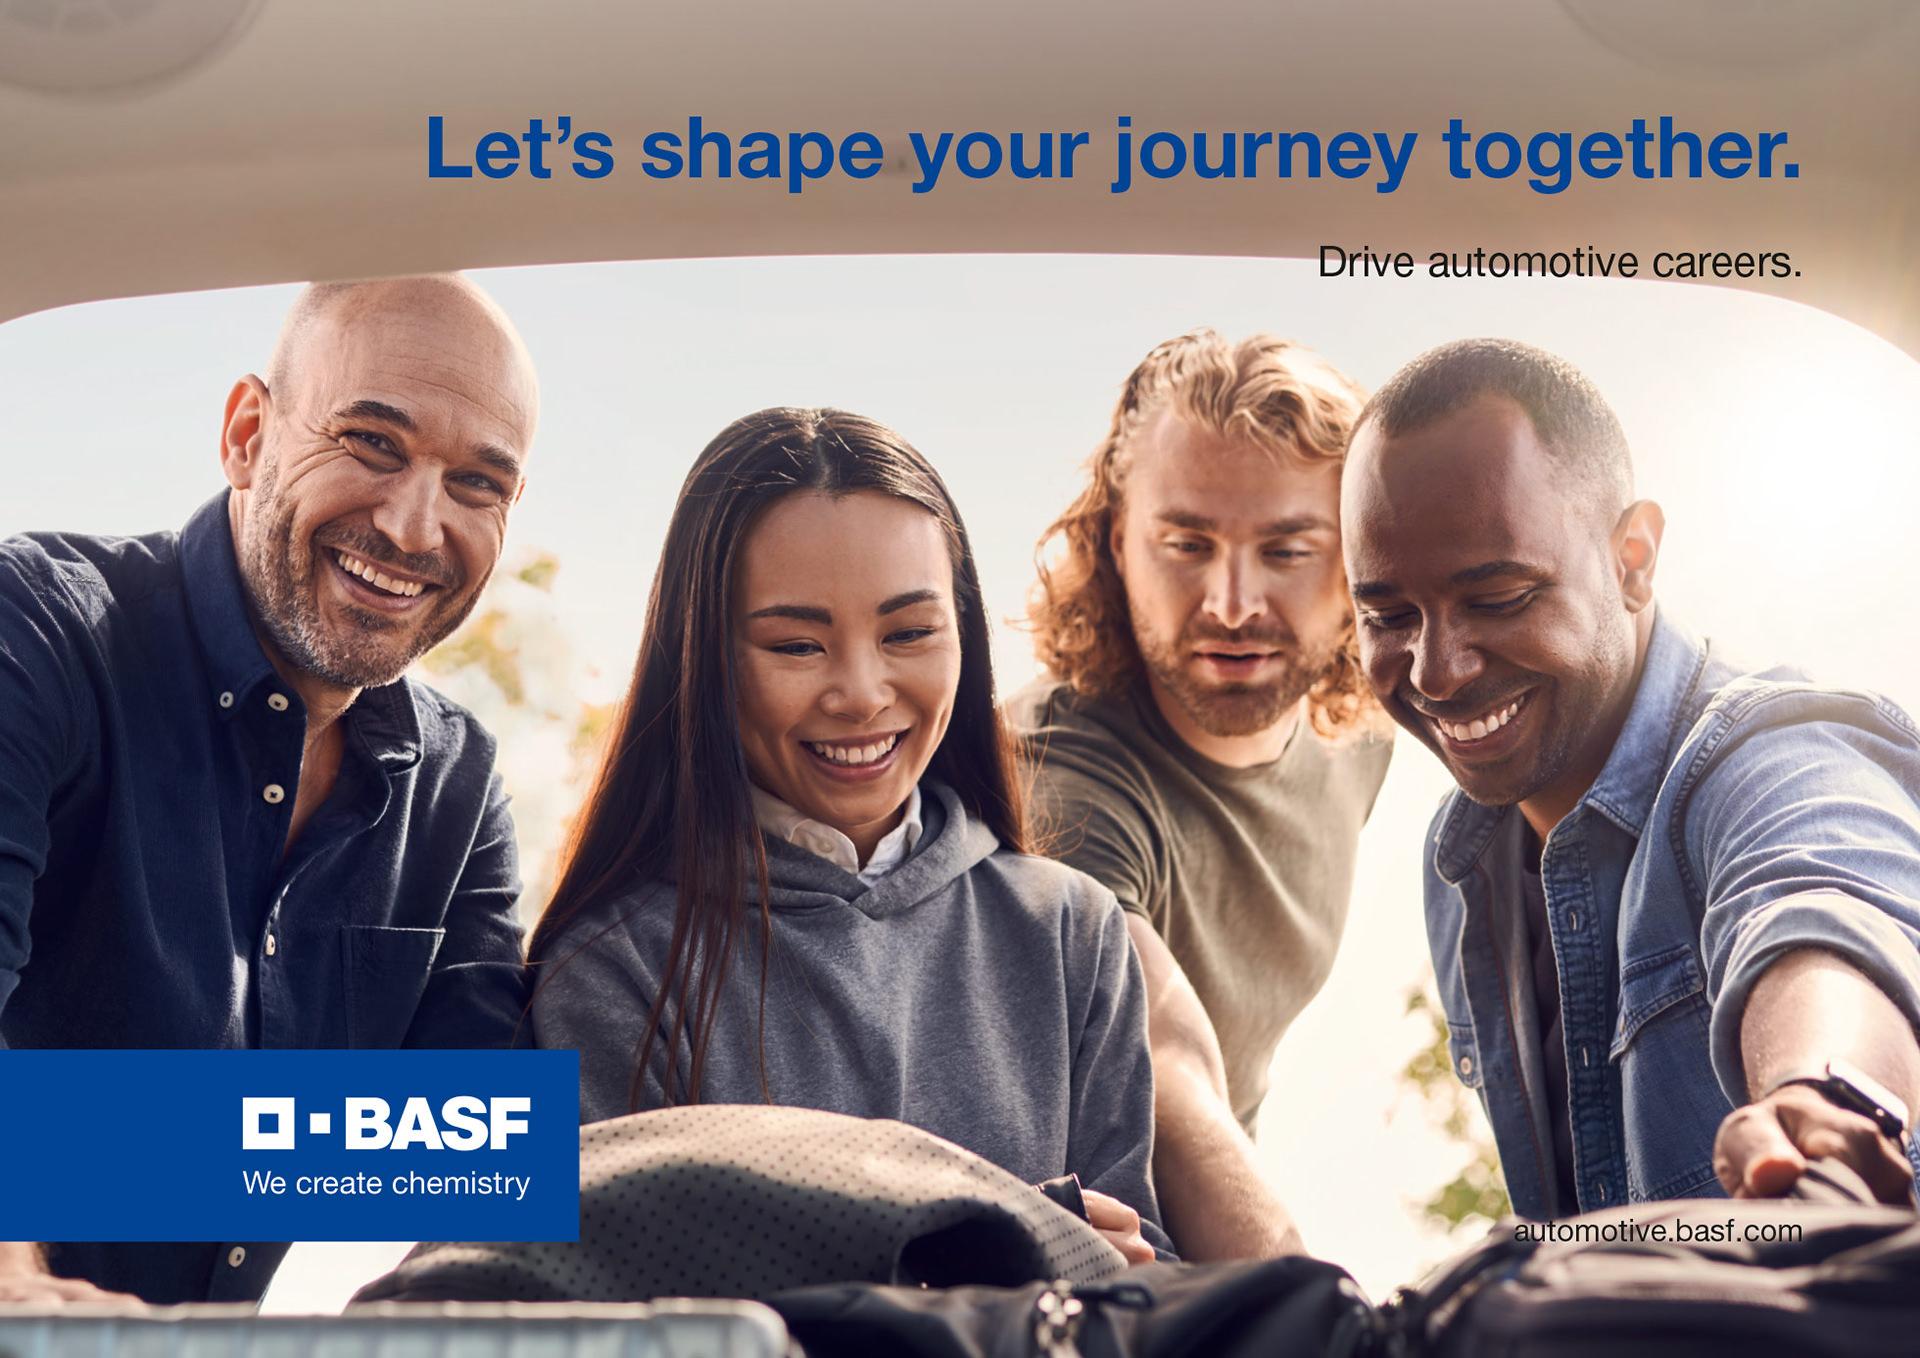 kofferraum-ansehen-freunde-auto-kampagne-basf